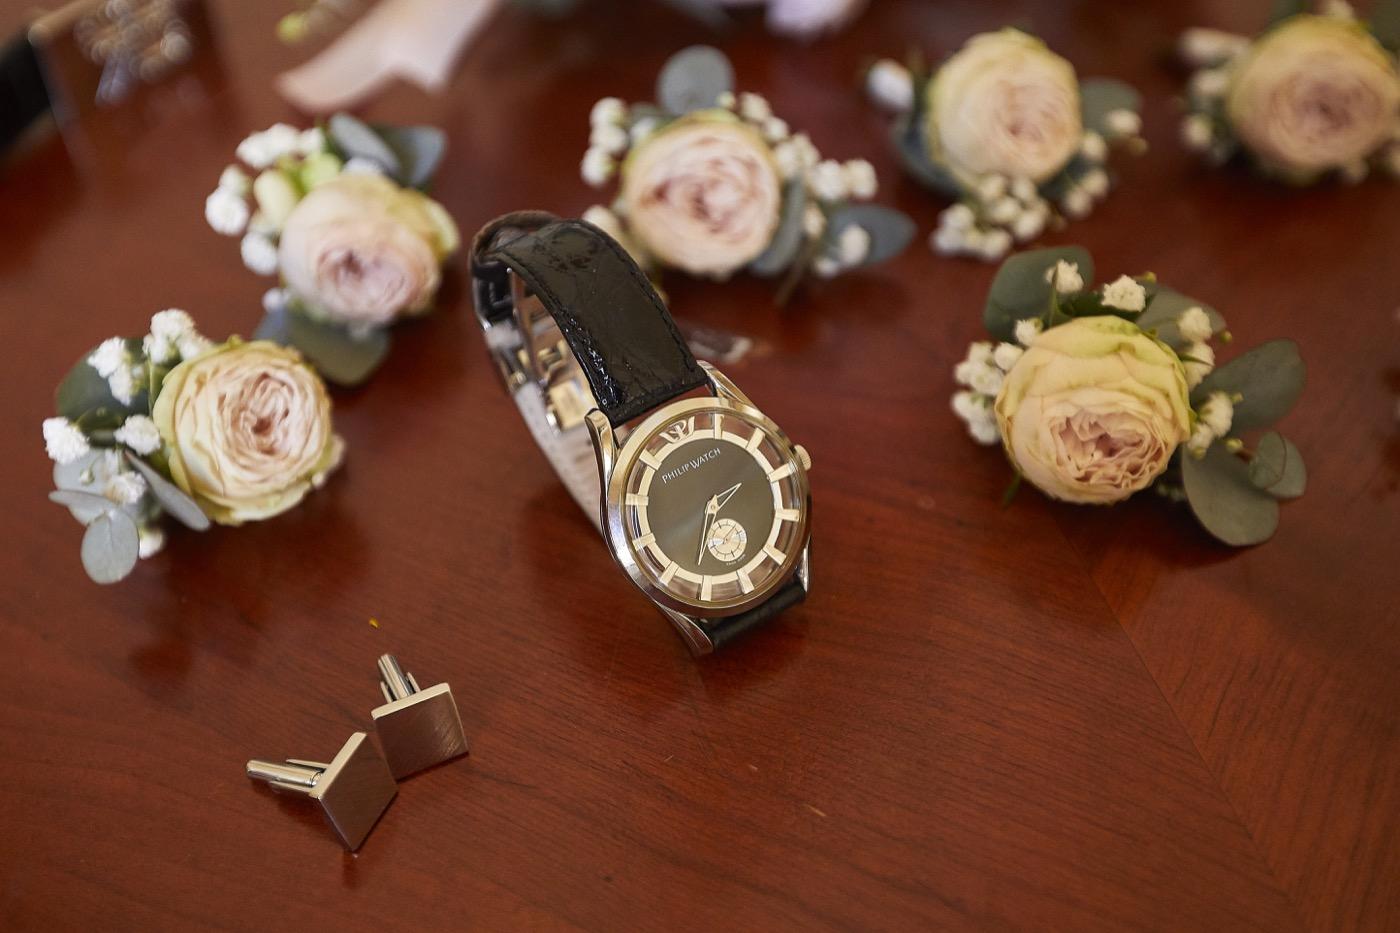 Claudio-Coppola-wedding-photographer-la-scuderia-eventi-preparativi-la-rosetta-perugia-5